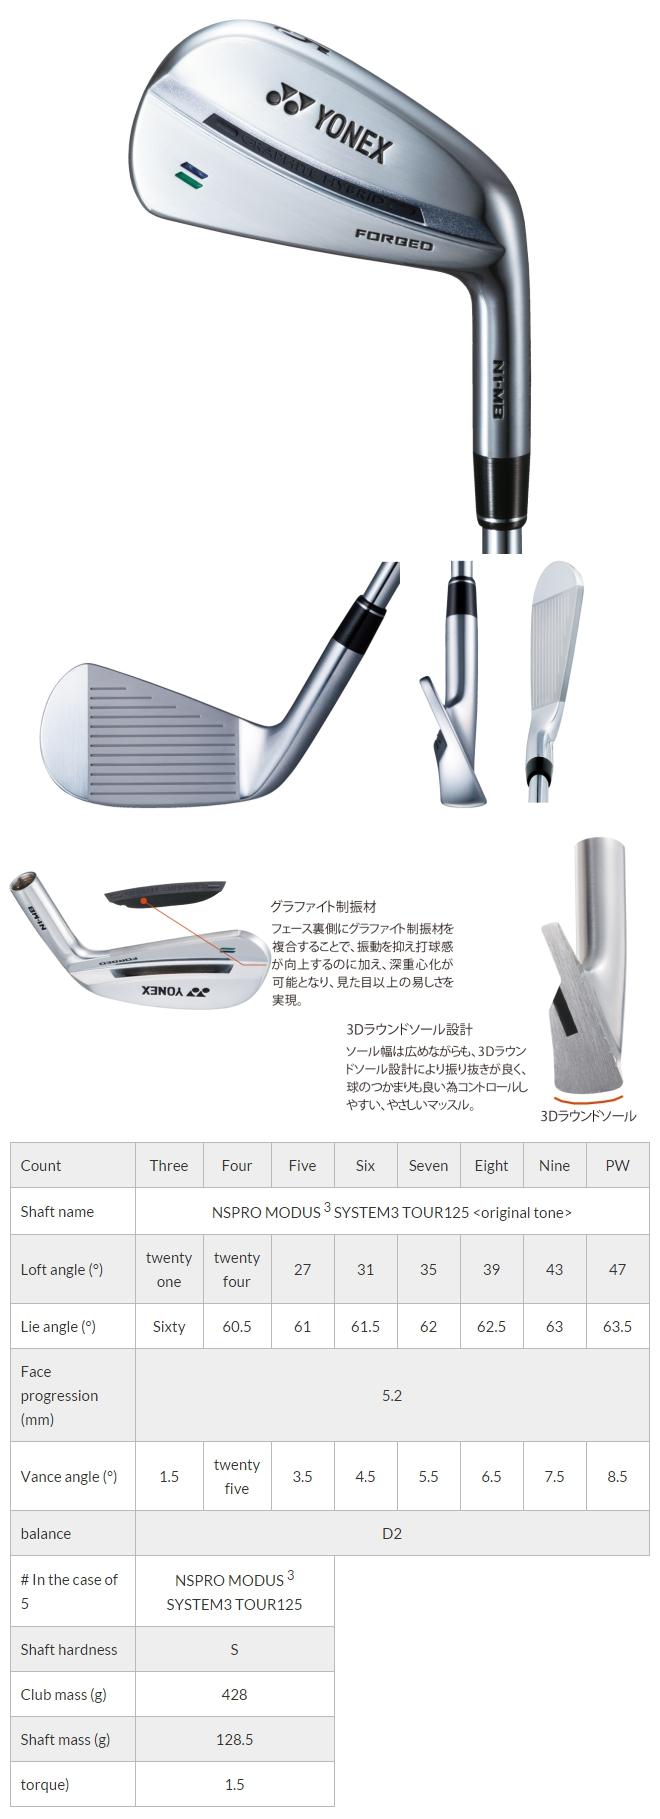 Yonex N1-MB Forged Iron